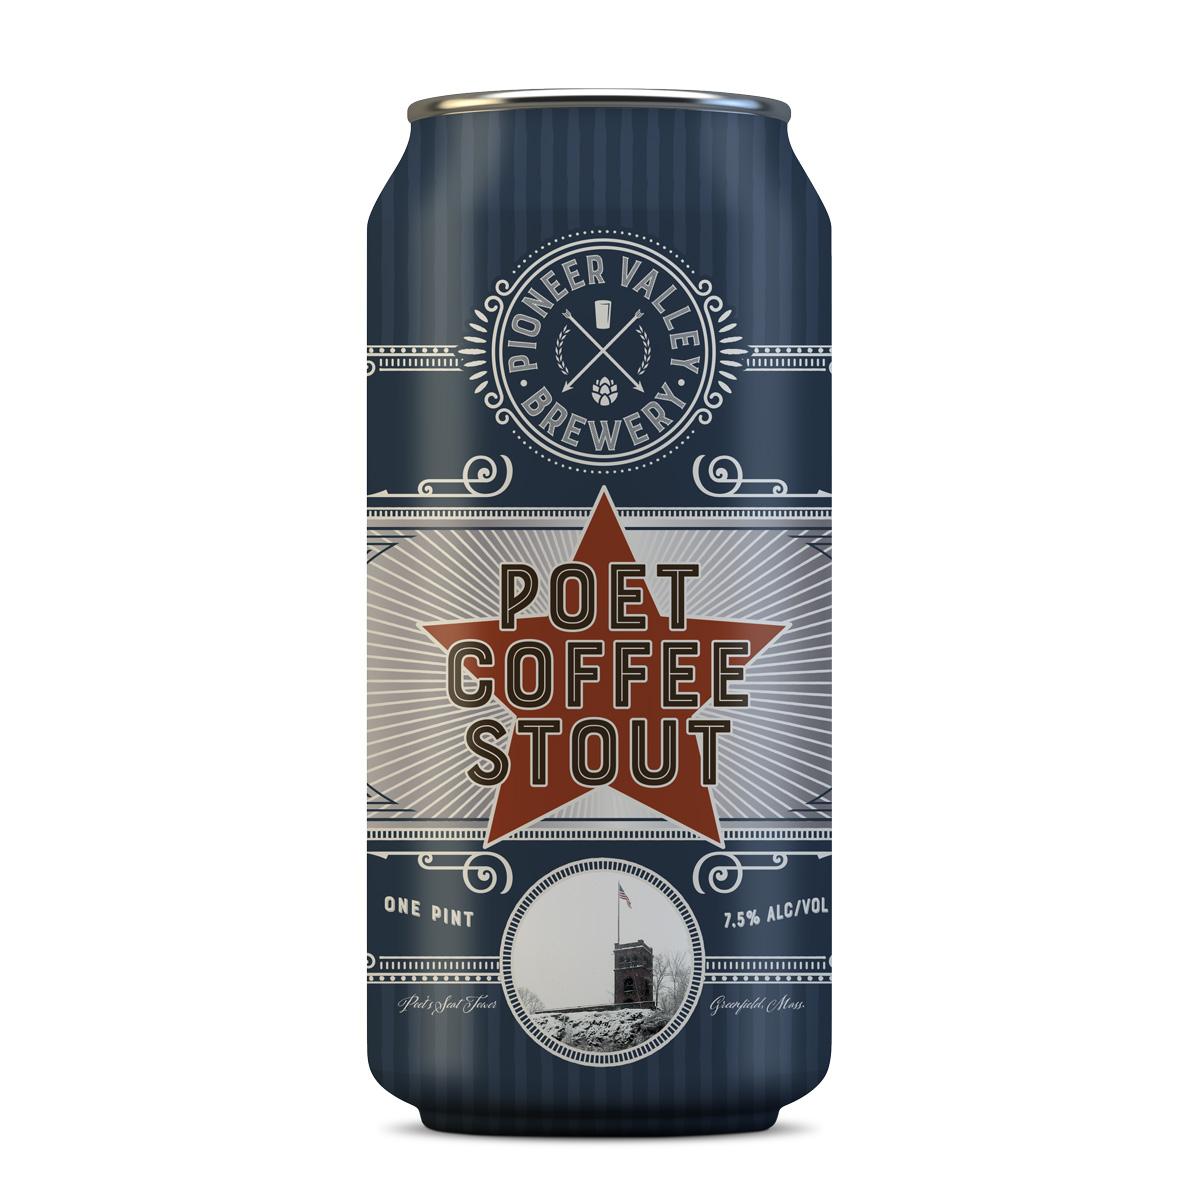 Poet Coffee Stout | Pioneer Valley Brewery